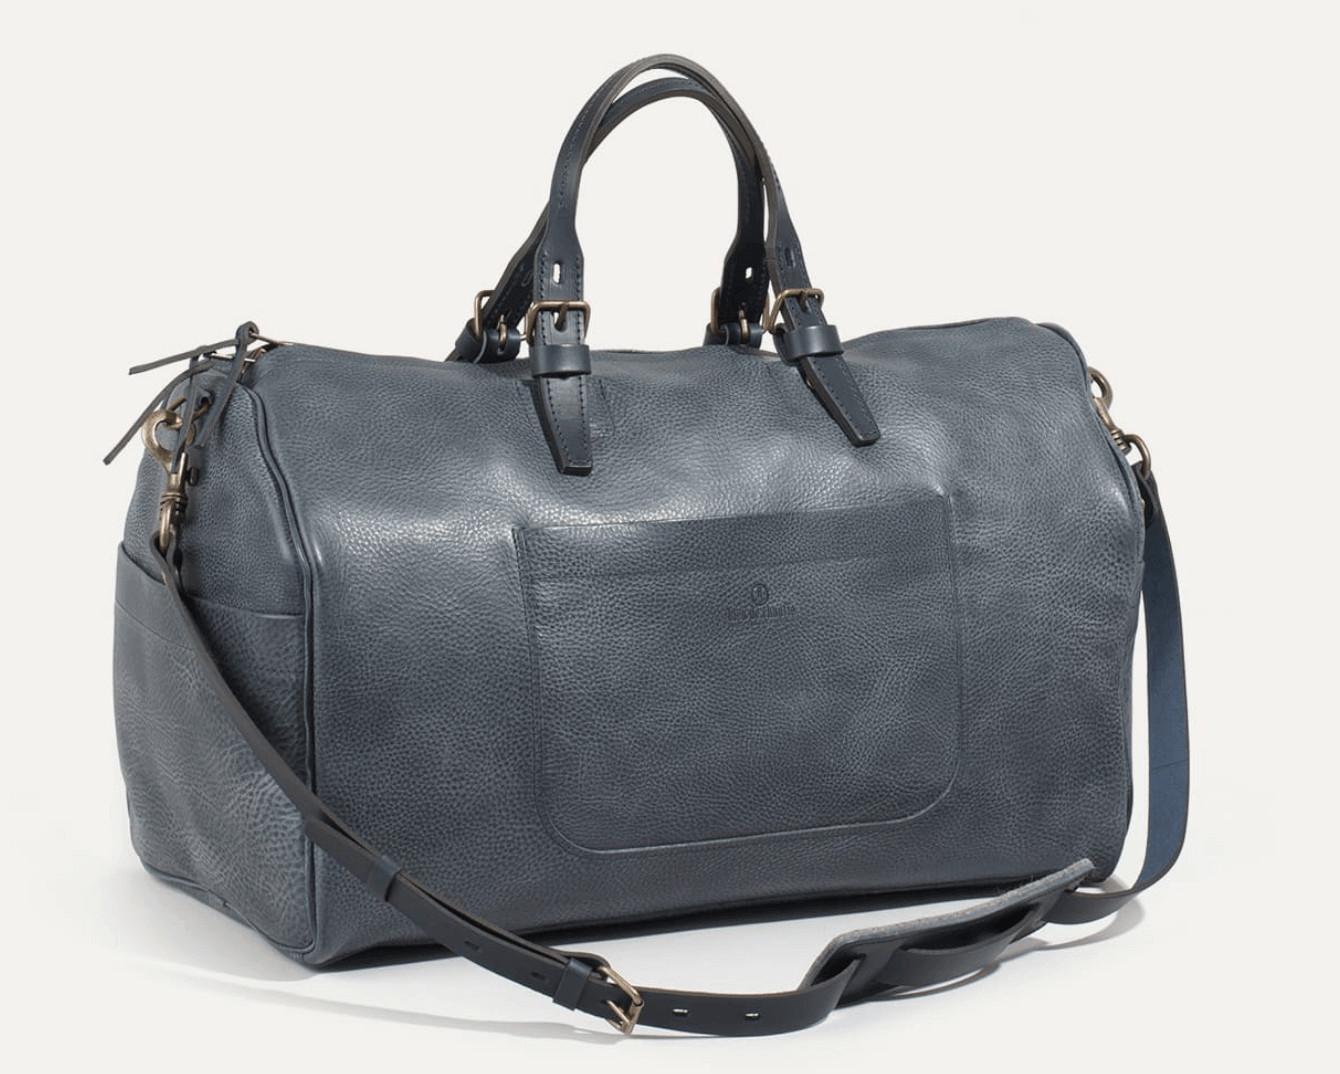 Weekend Getaway Style Travel Bag OuiPlease Homme OuiBlog